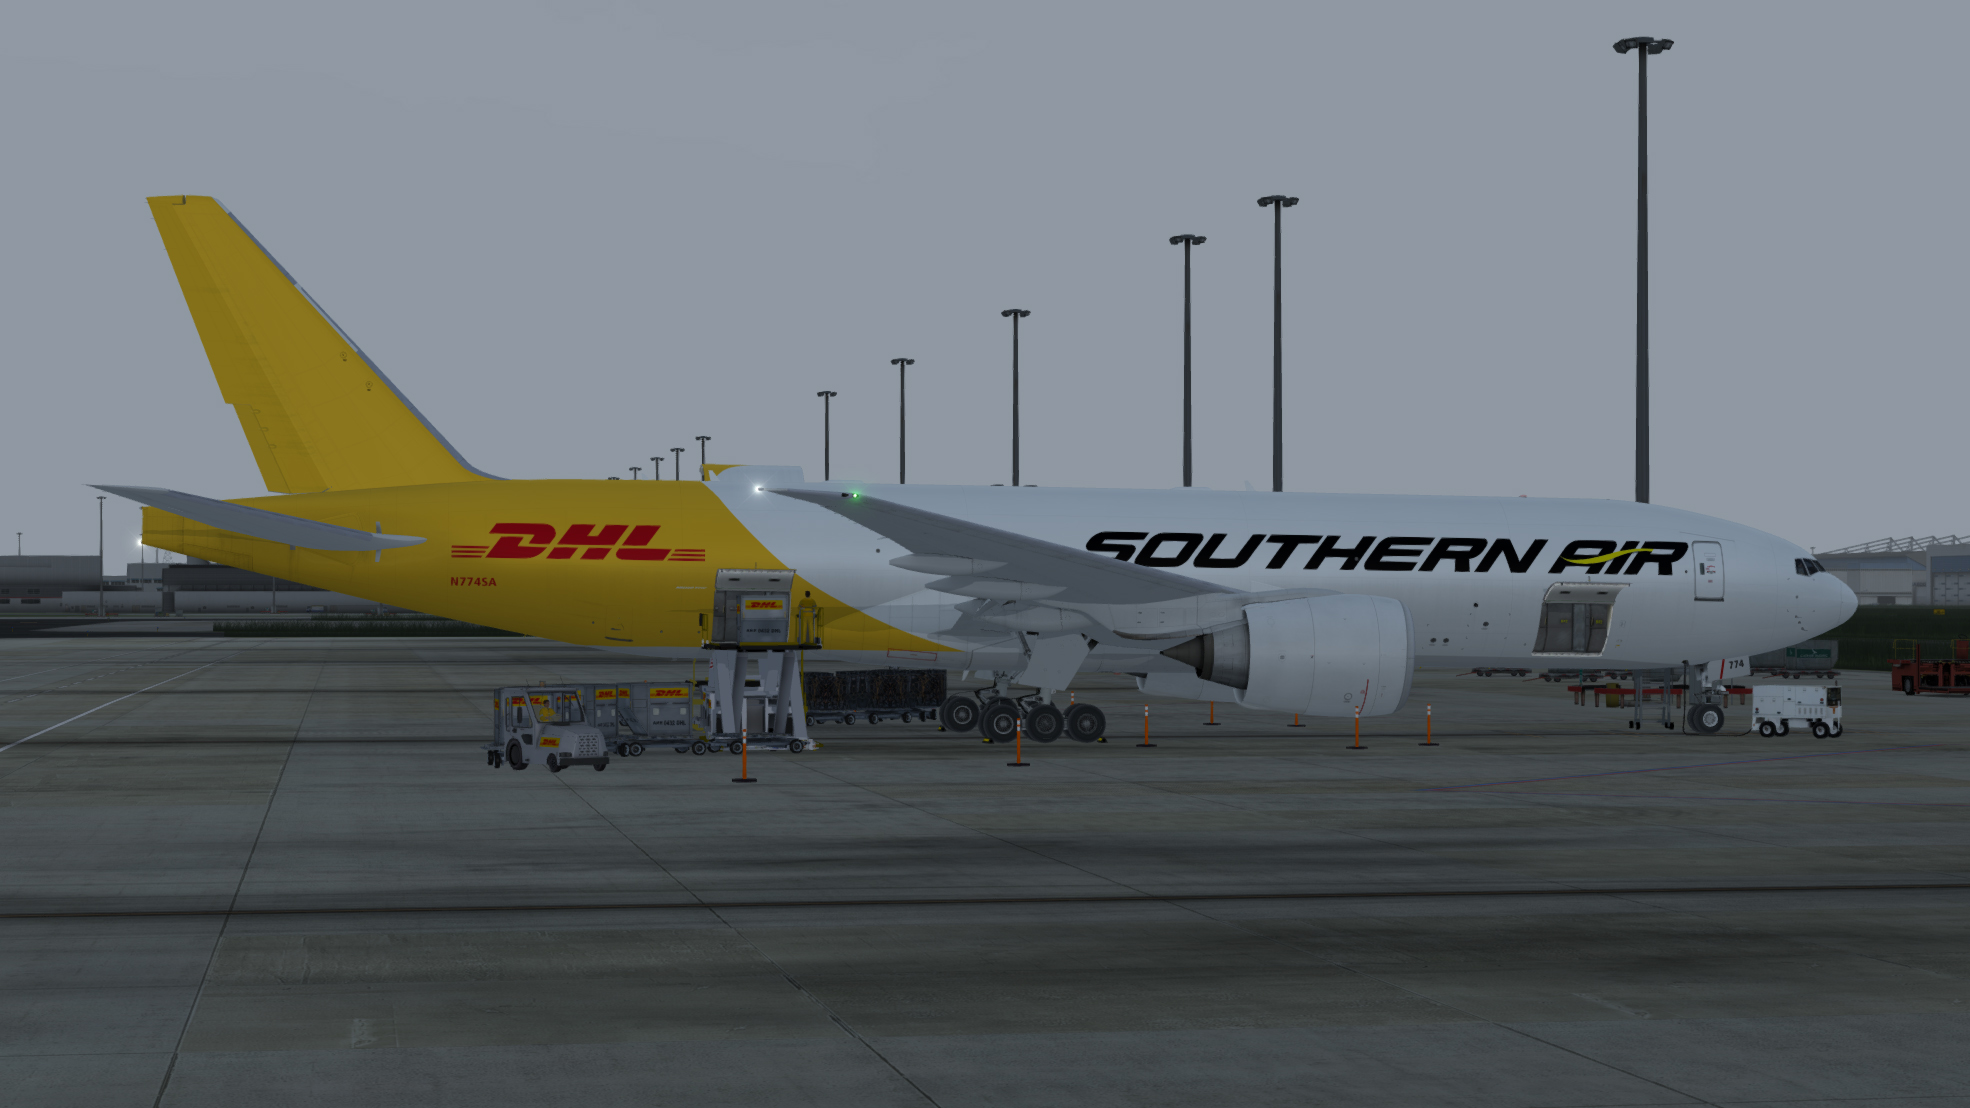 southernnew.jpg